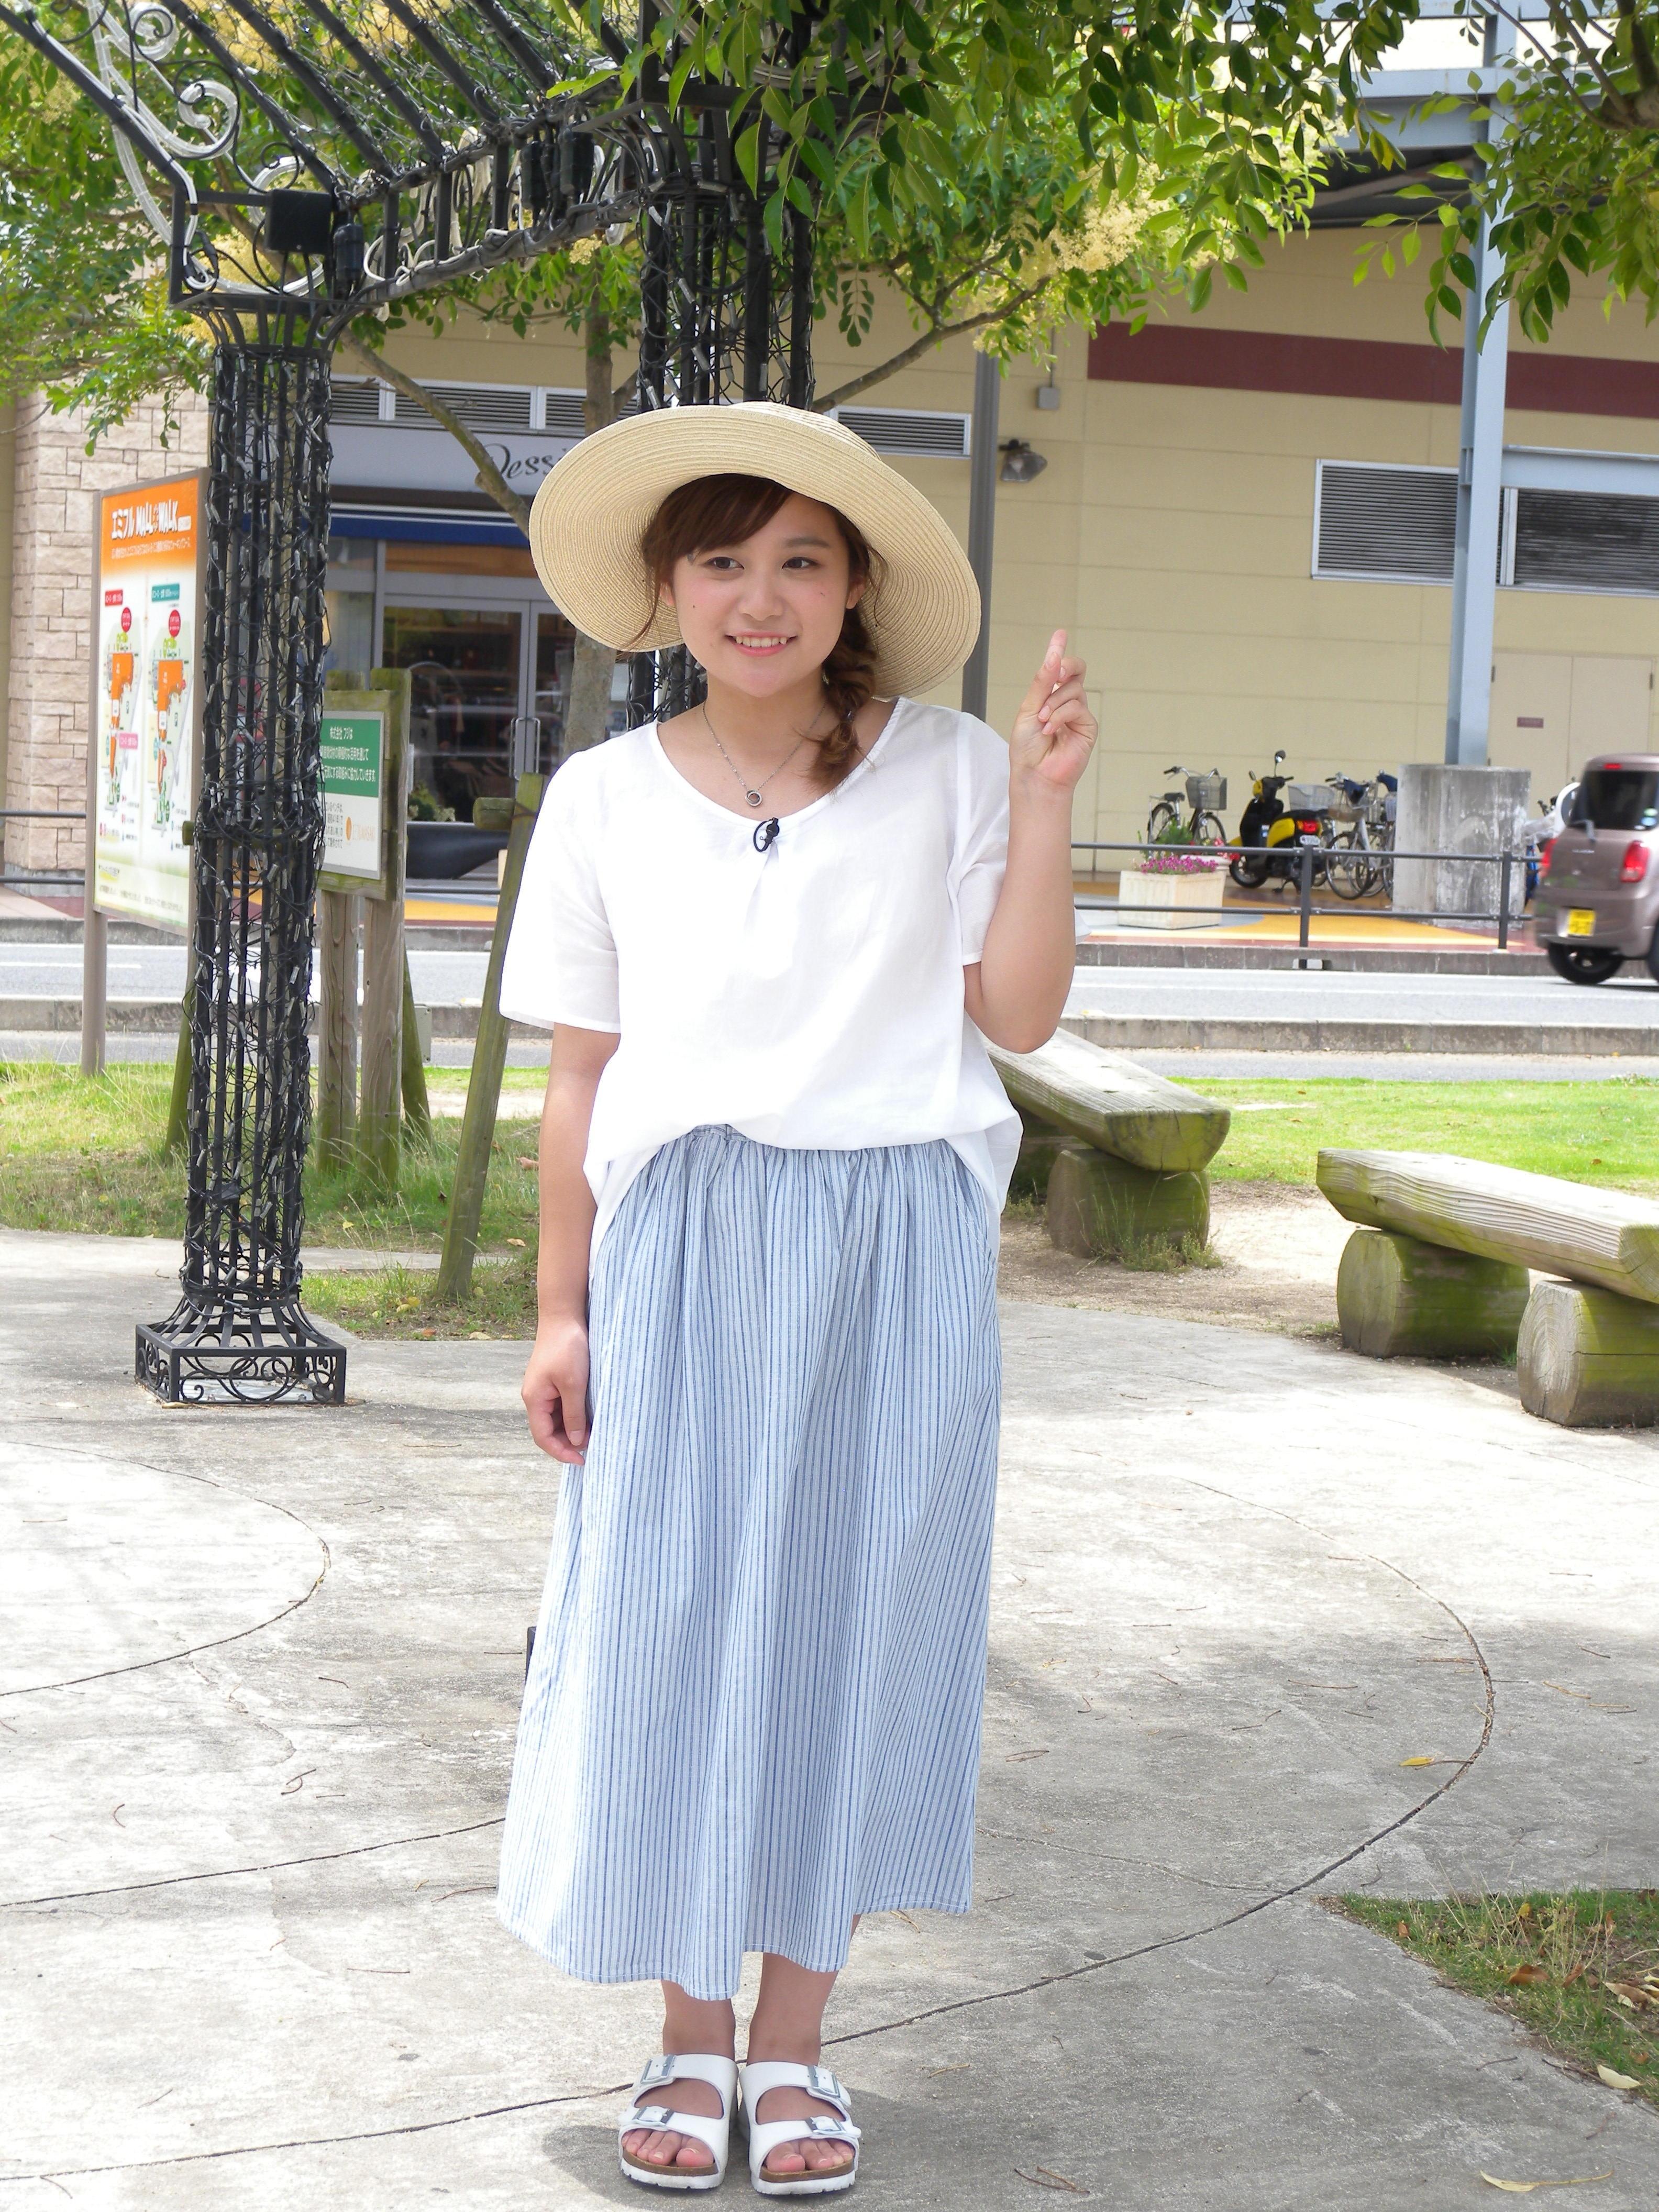 https://emifull.jp/emifulls_blog/11th/uploads/1911dae4479a45562dff525d2a641d0770100cbb.JPG